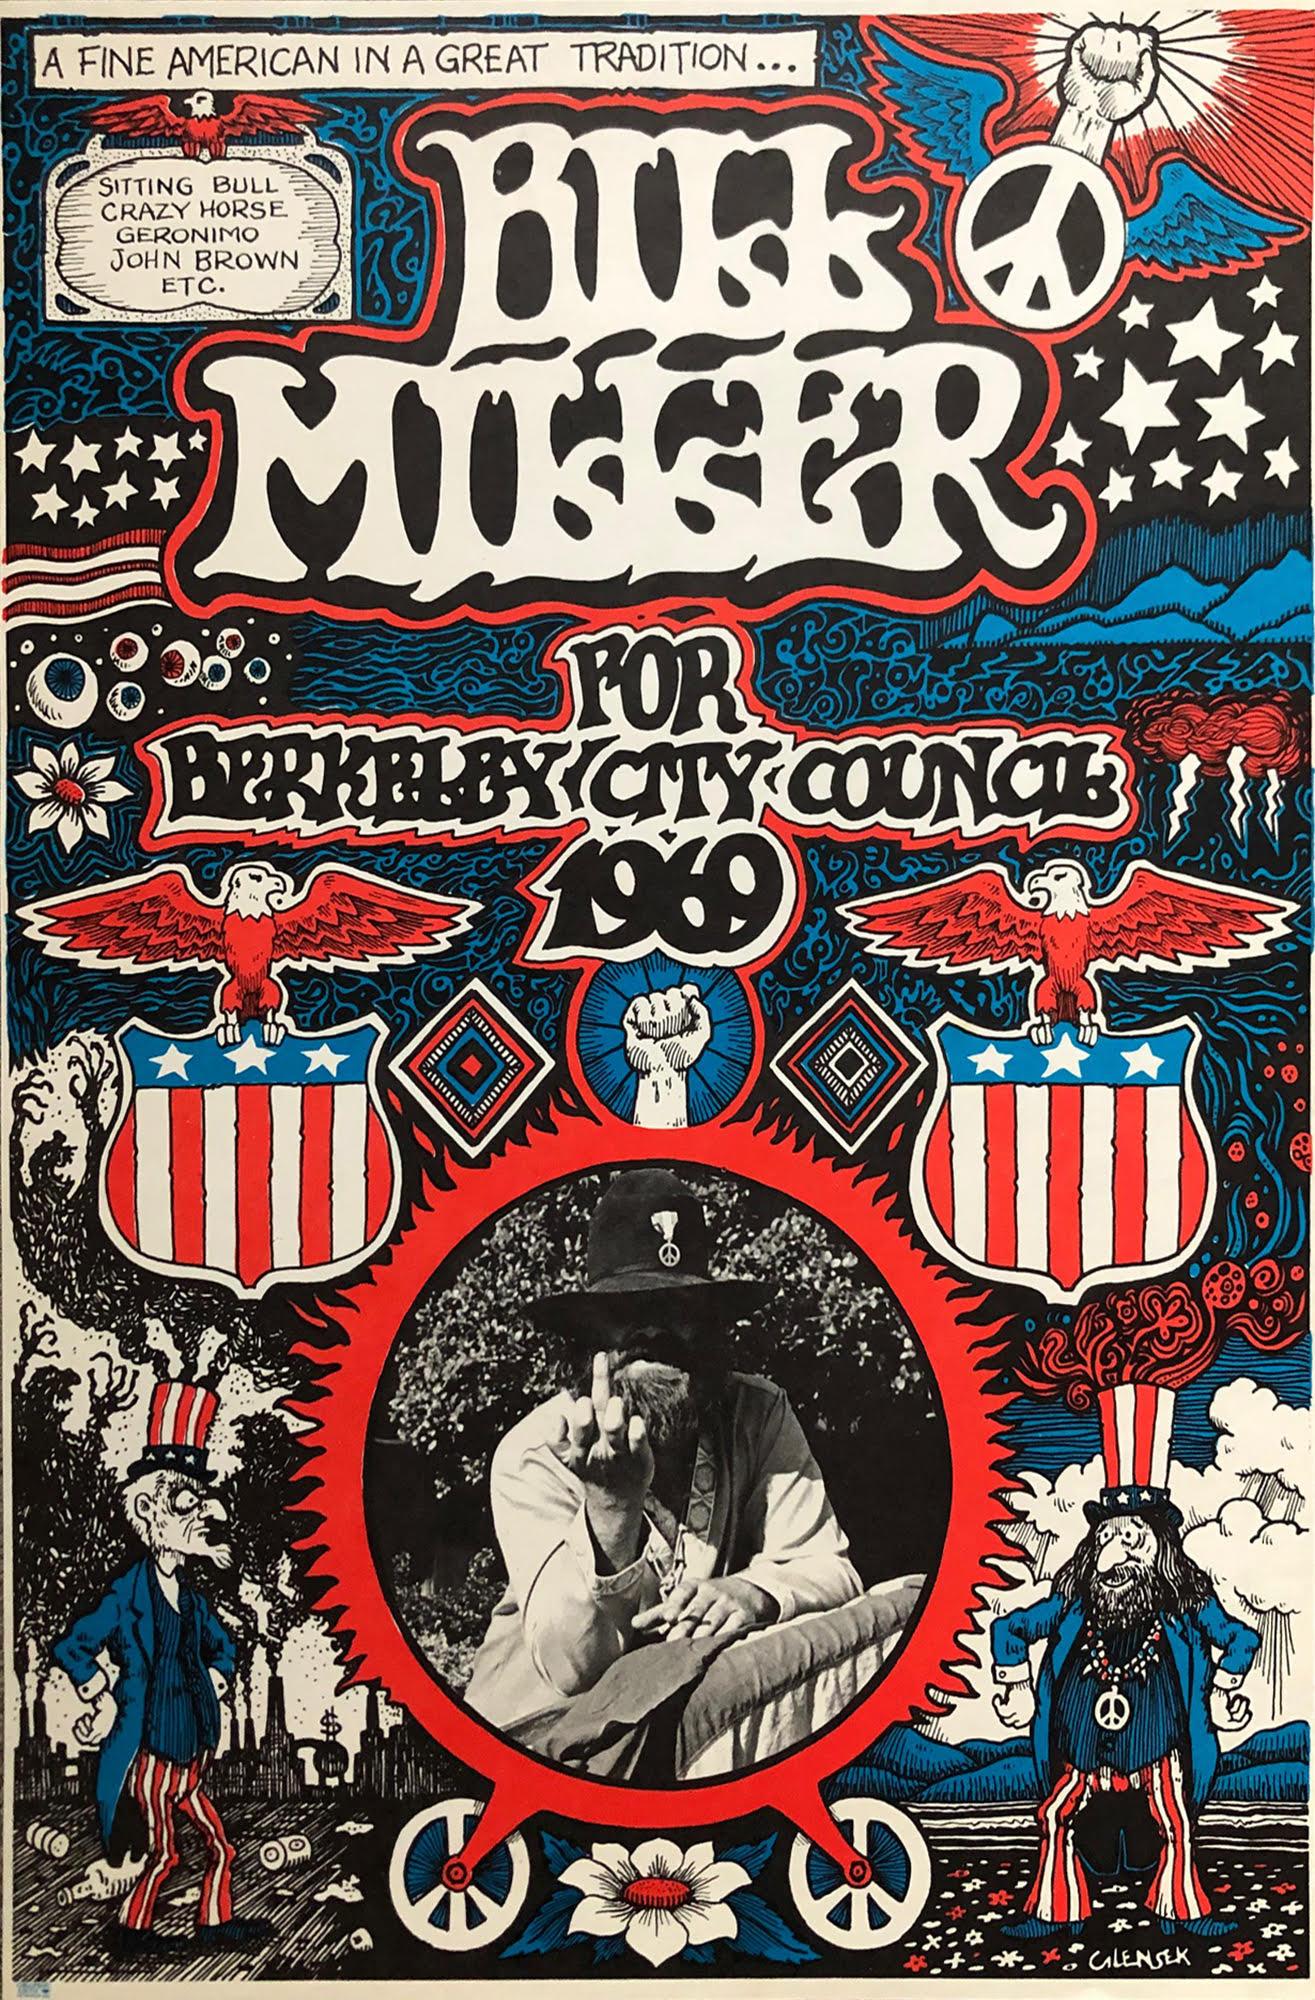 Bill Miller Poster